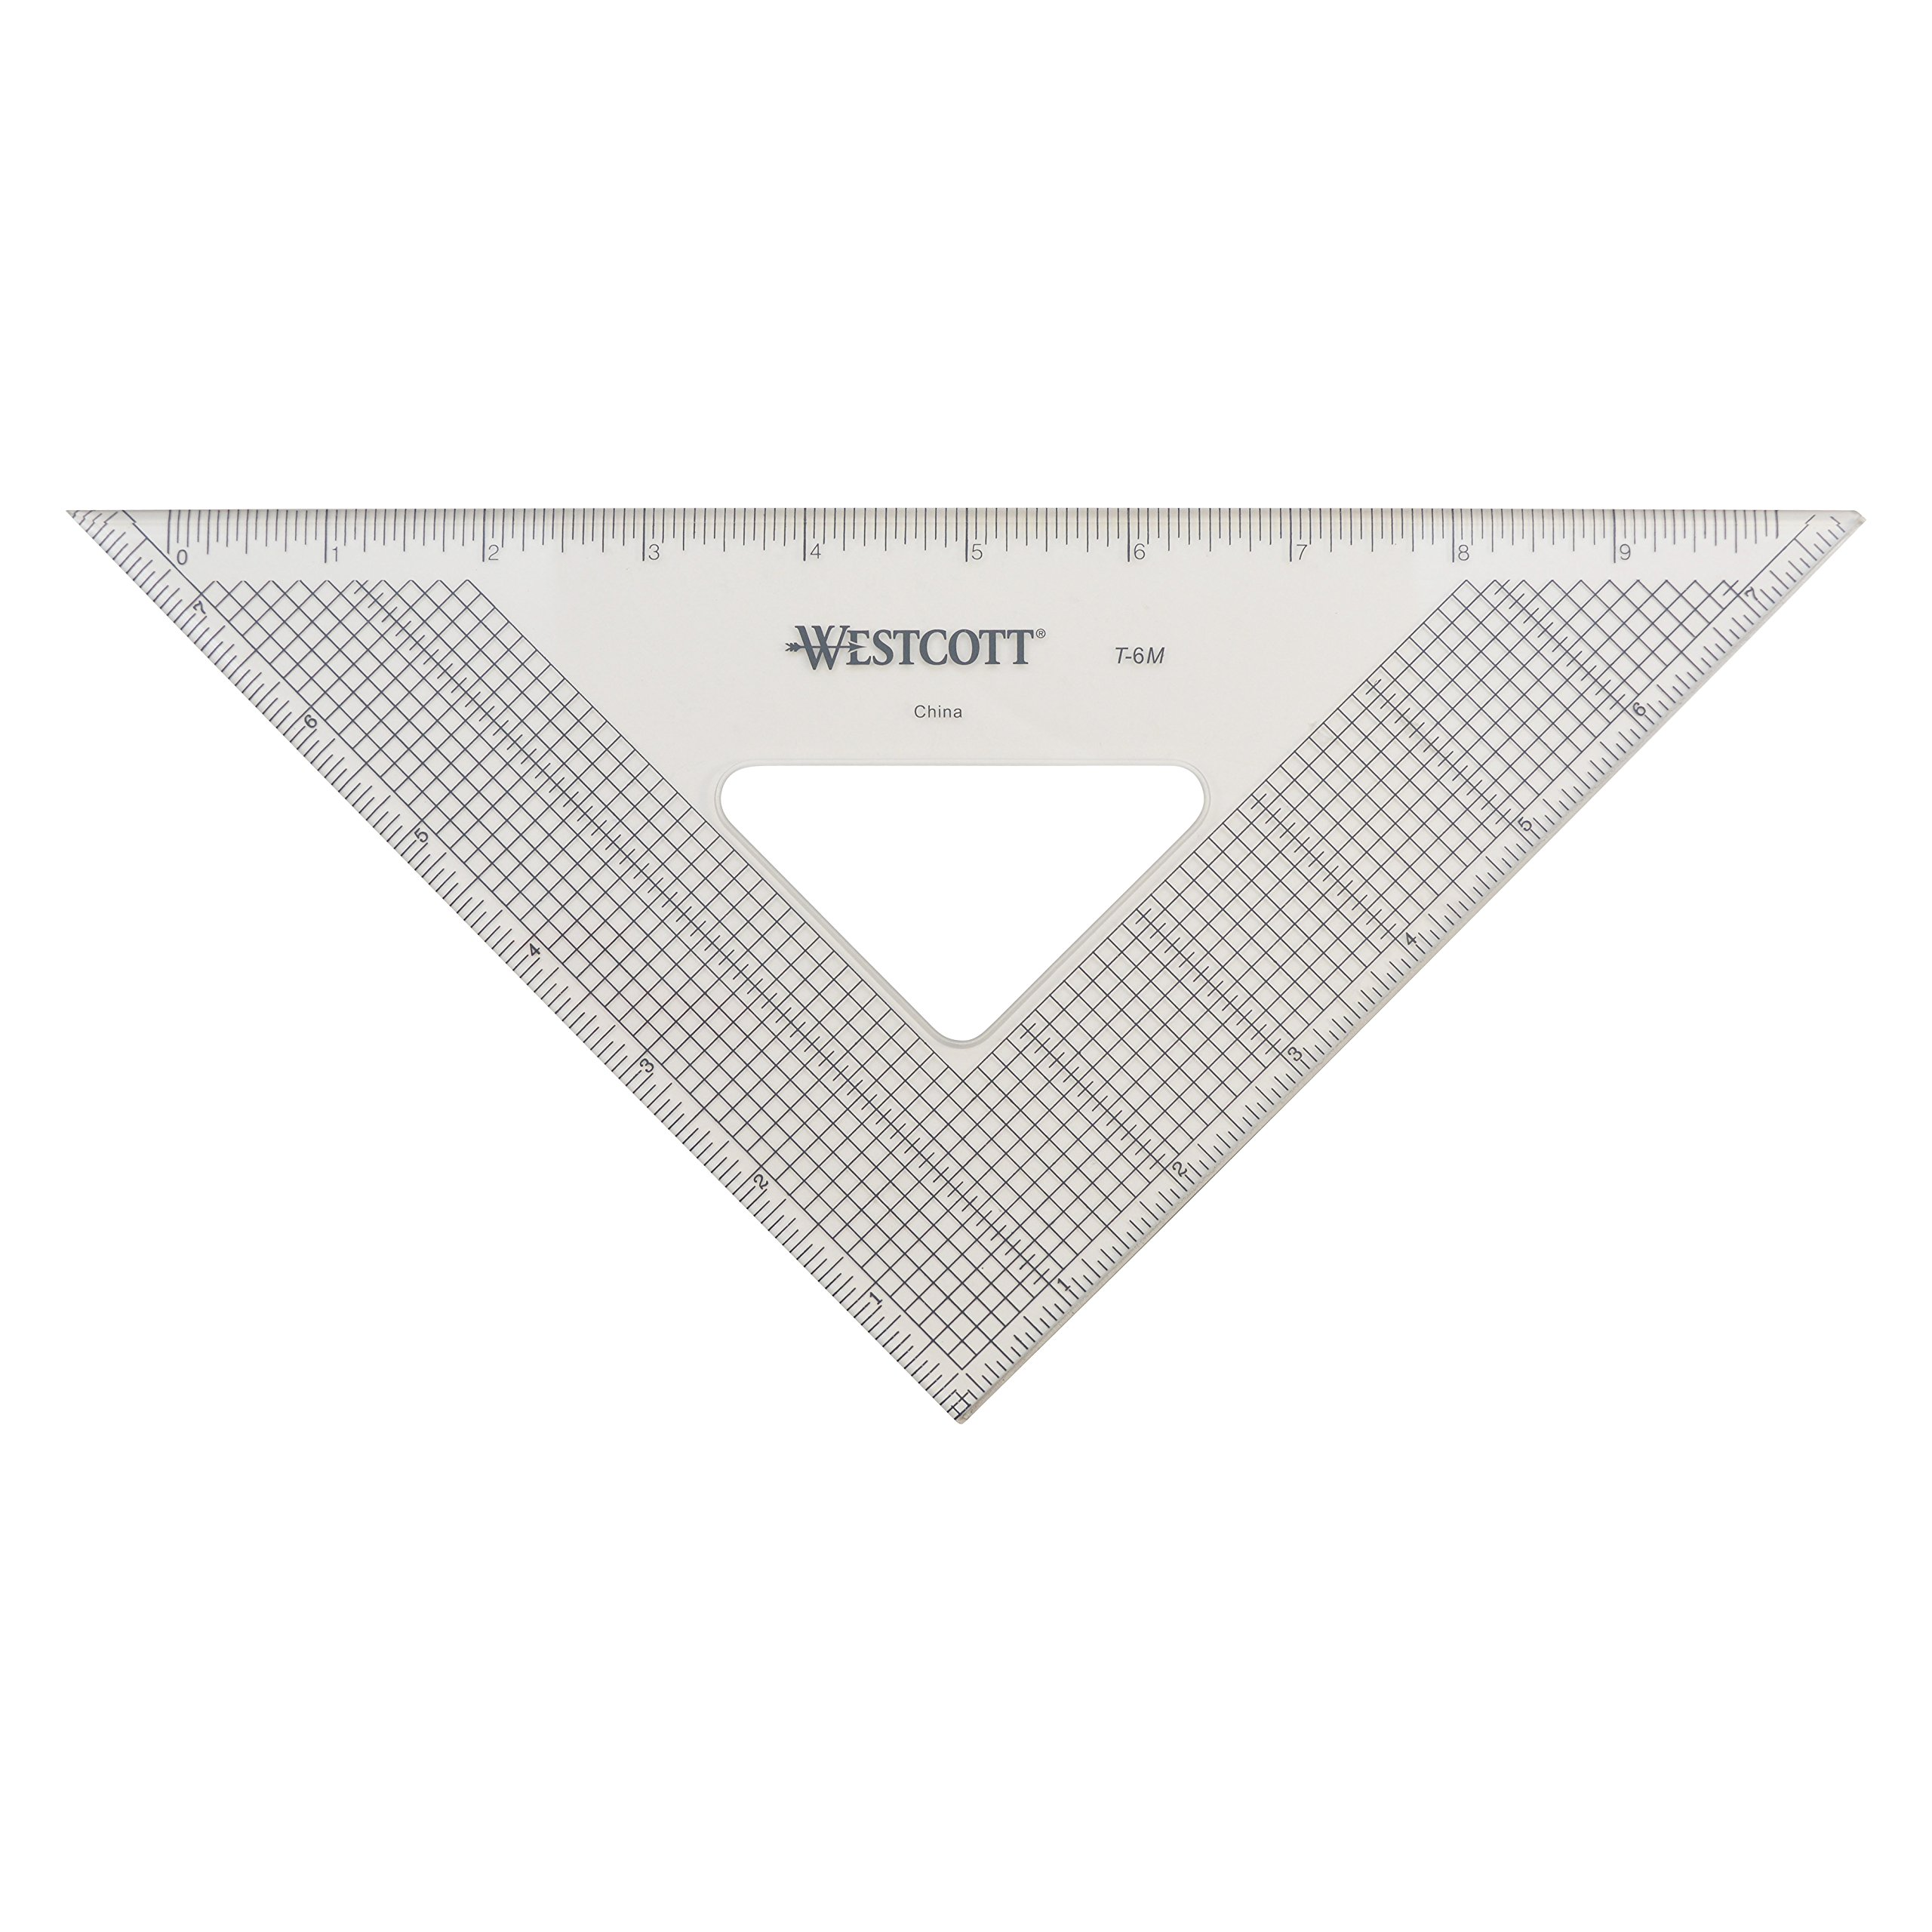 Westcott Grid Triangle, 8'', 45/90 Degree, Transparent (T-6M) by Westcott (Image #1)